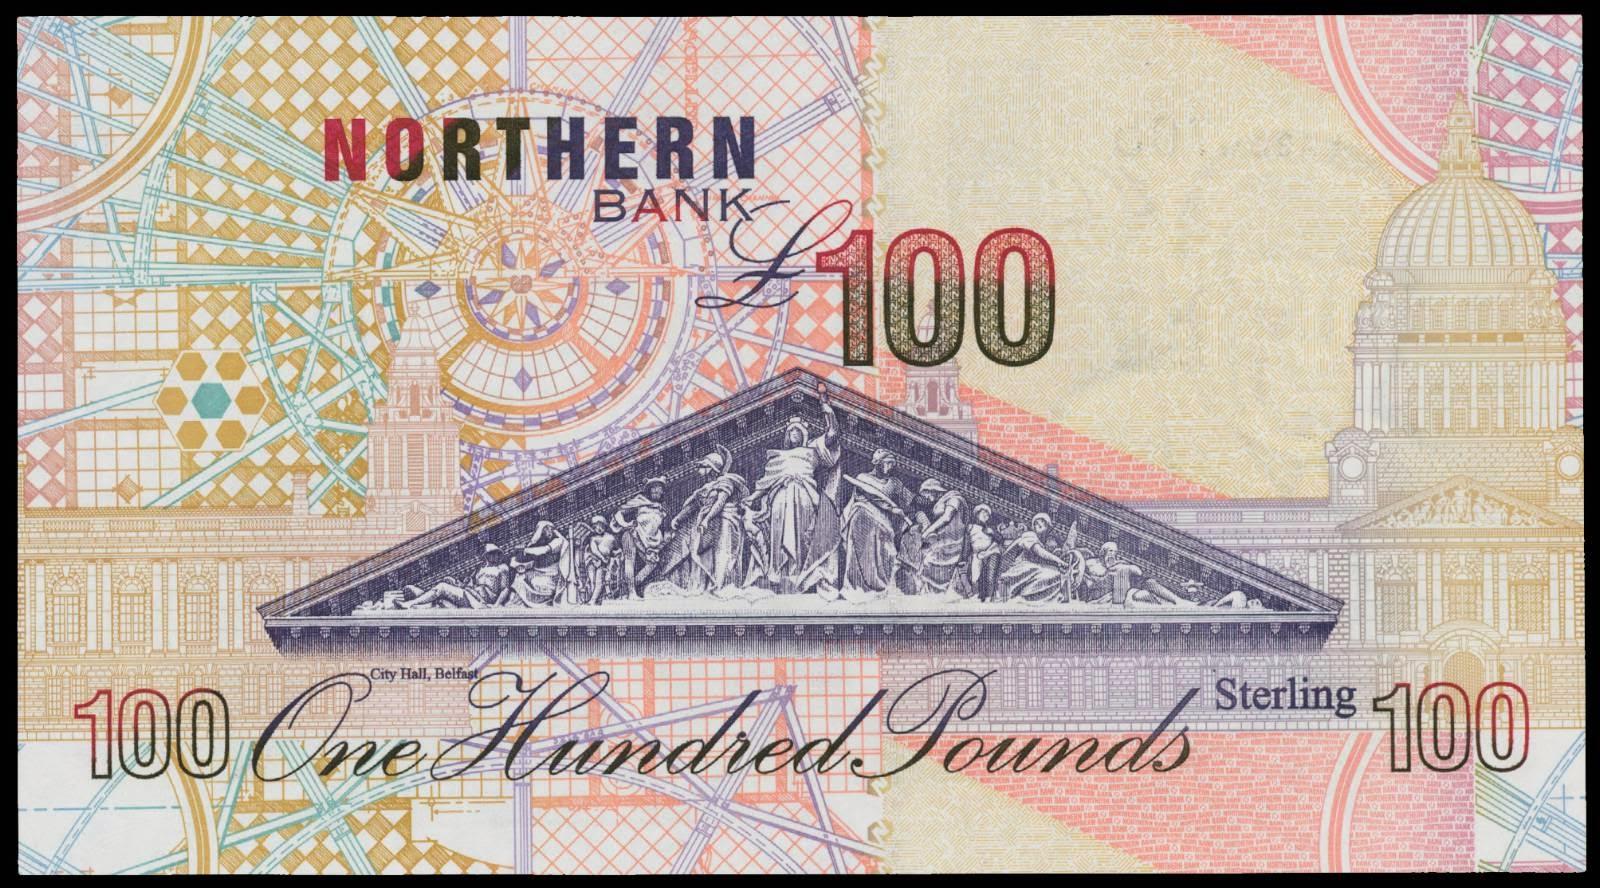 100 pound note 1999 northern bankworld banknotes amp coins